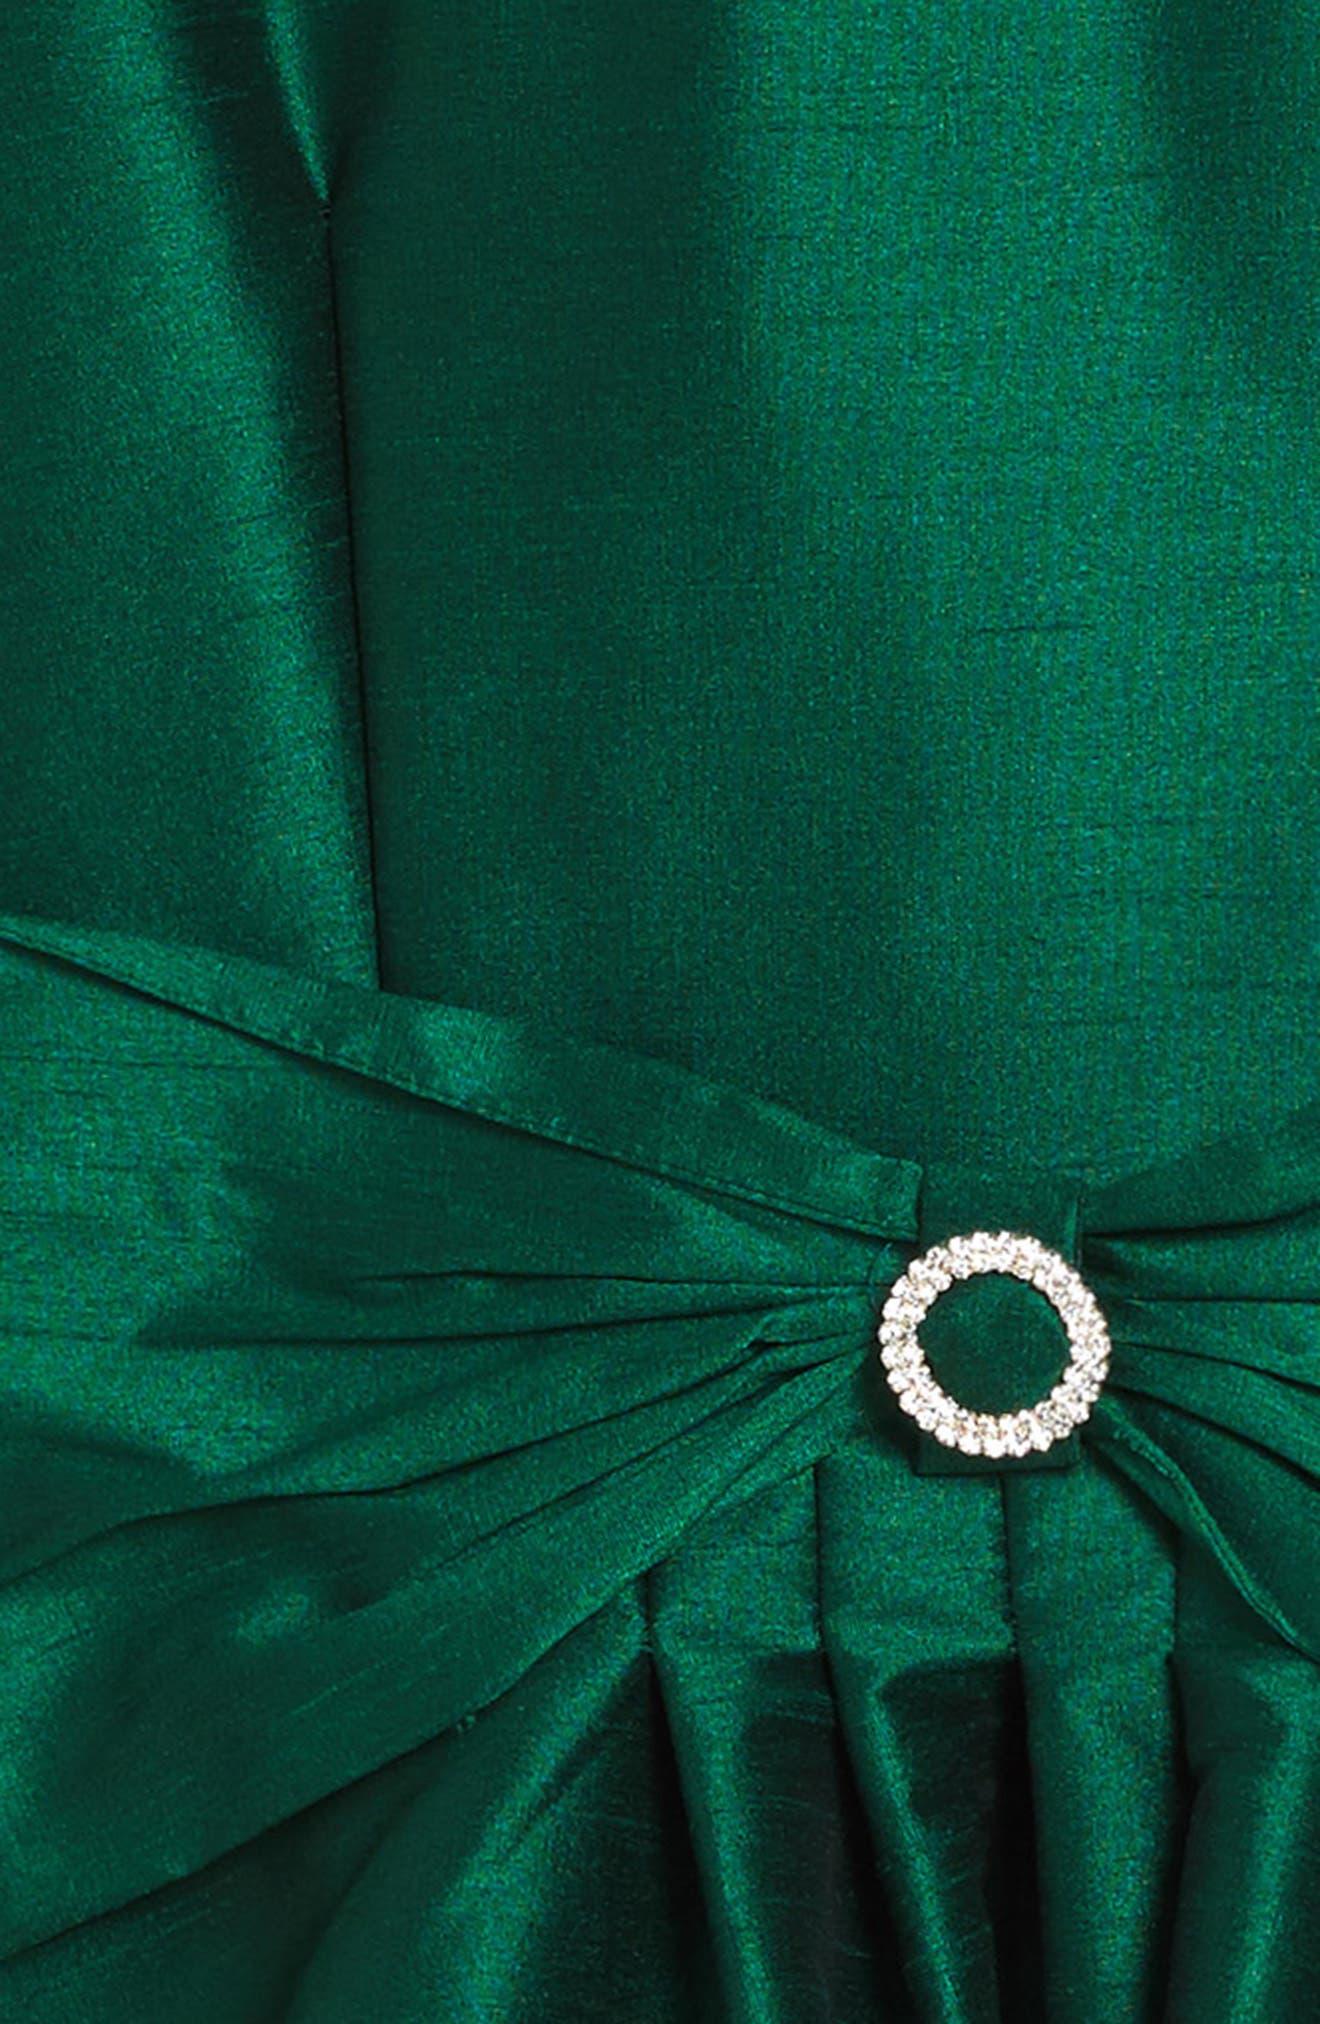 Alternate Image 3  - Fiveloaves Twofish Holiday Beauty Sleeveless Dress (Big Girls)